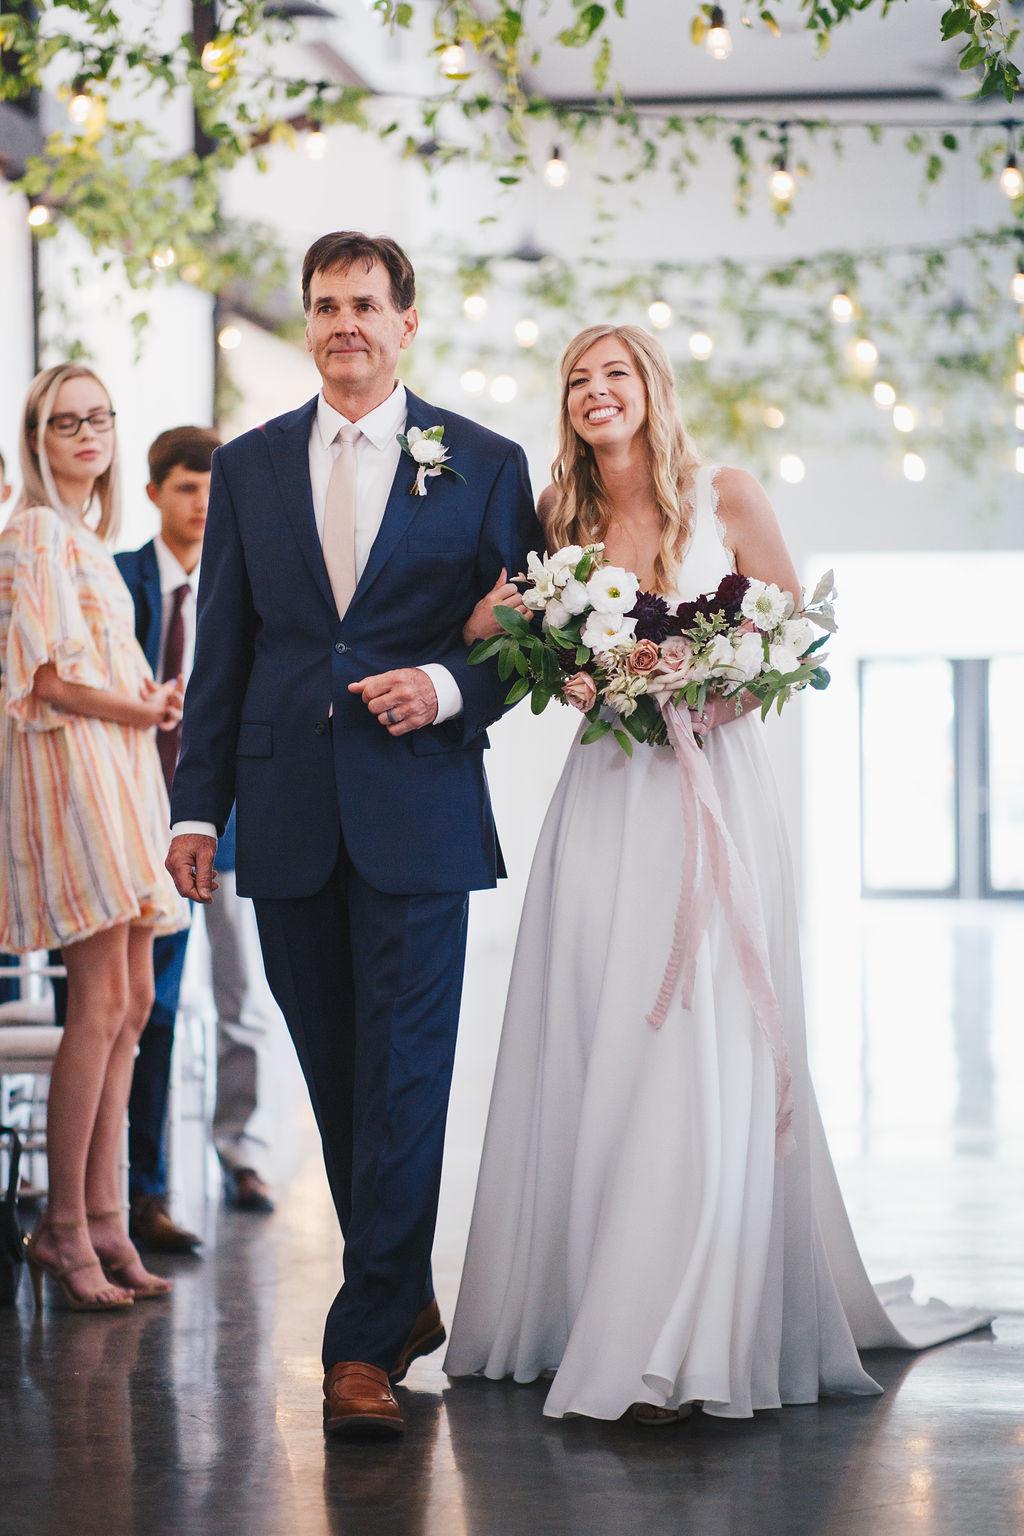 Bixby White Barn Tulsa Wedding 57.jpg